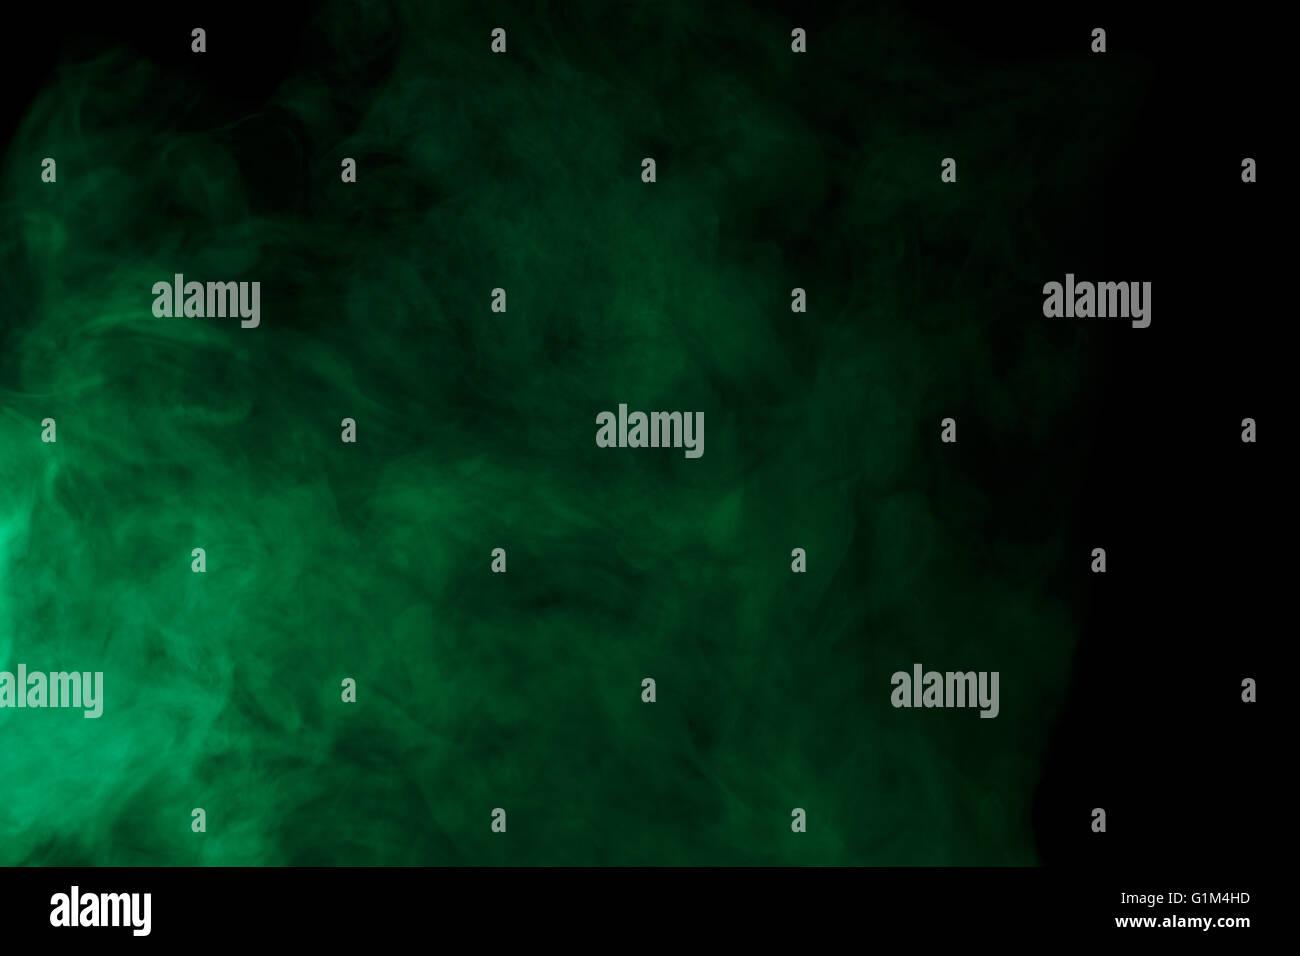 abstract art. green smoke hookah on a black background. inhalation